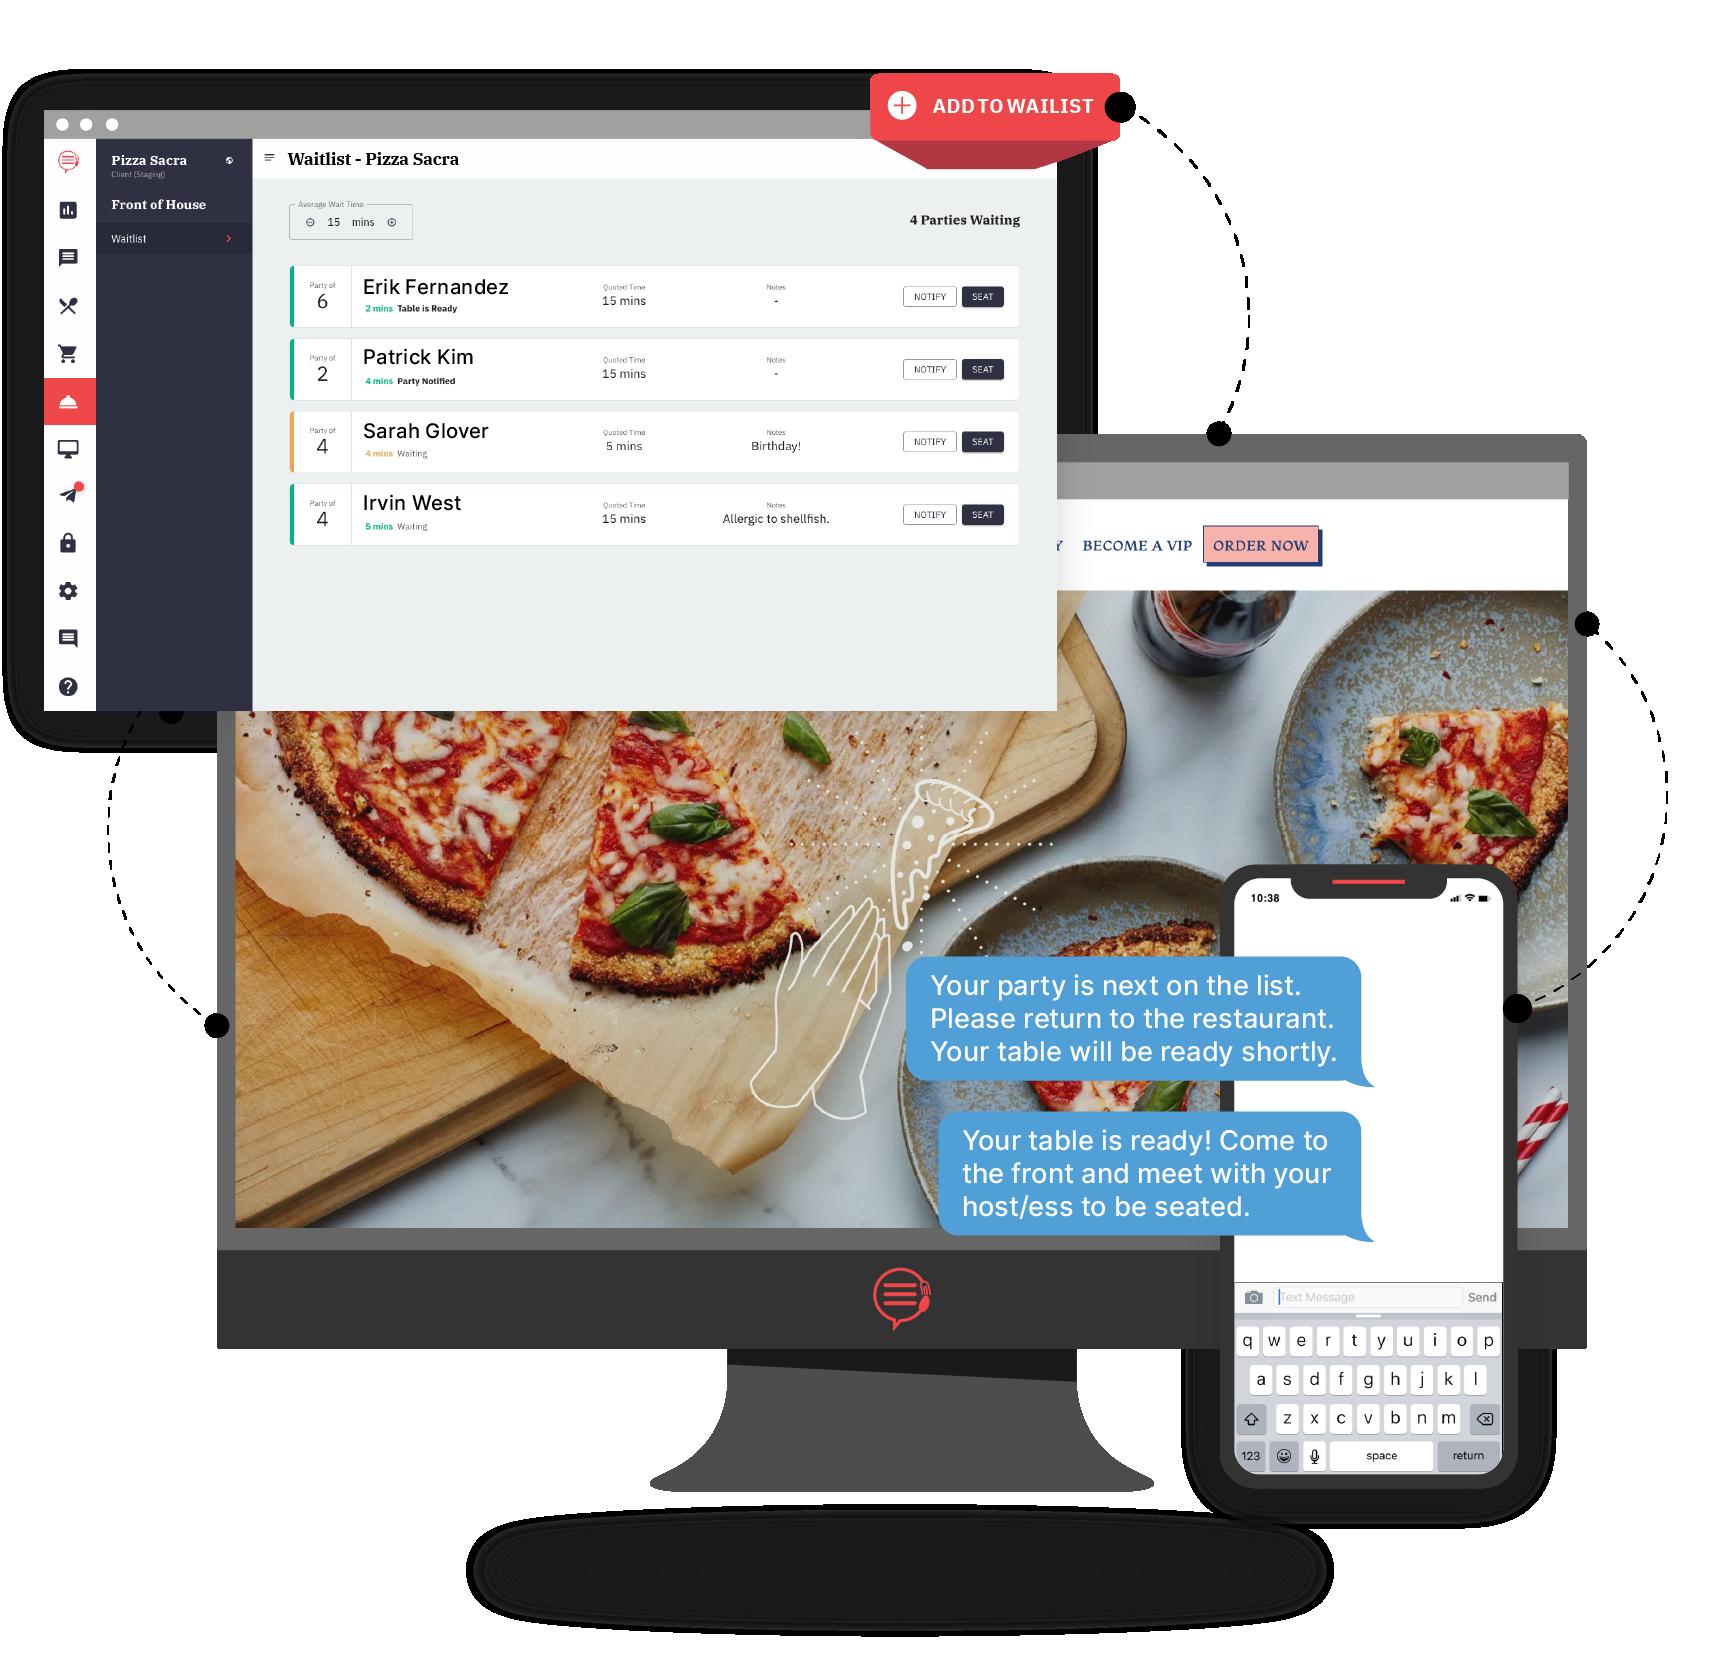 Desktop and phone screen showing Popmenu Waitlisting process